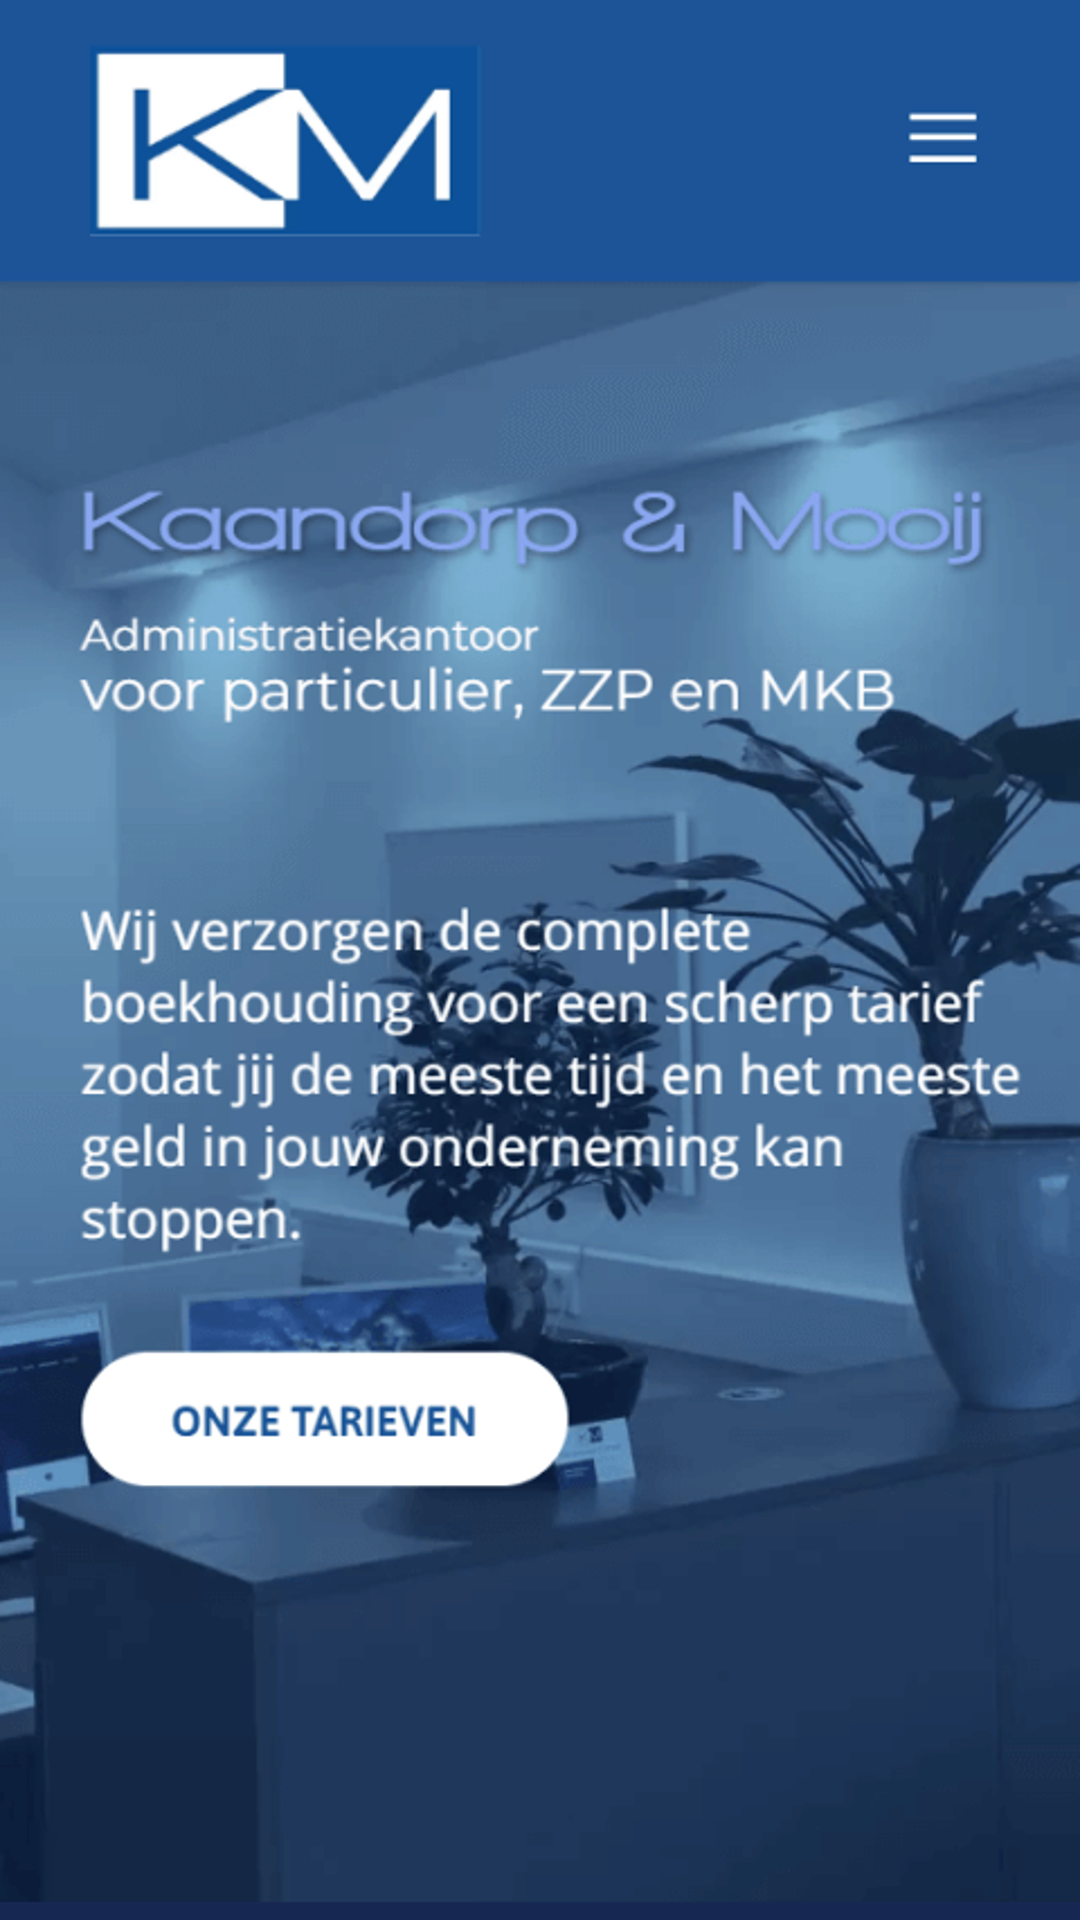 Kaandorp & Mooij - After - Mobielweergave